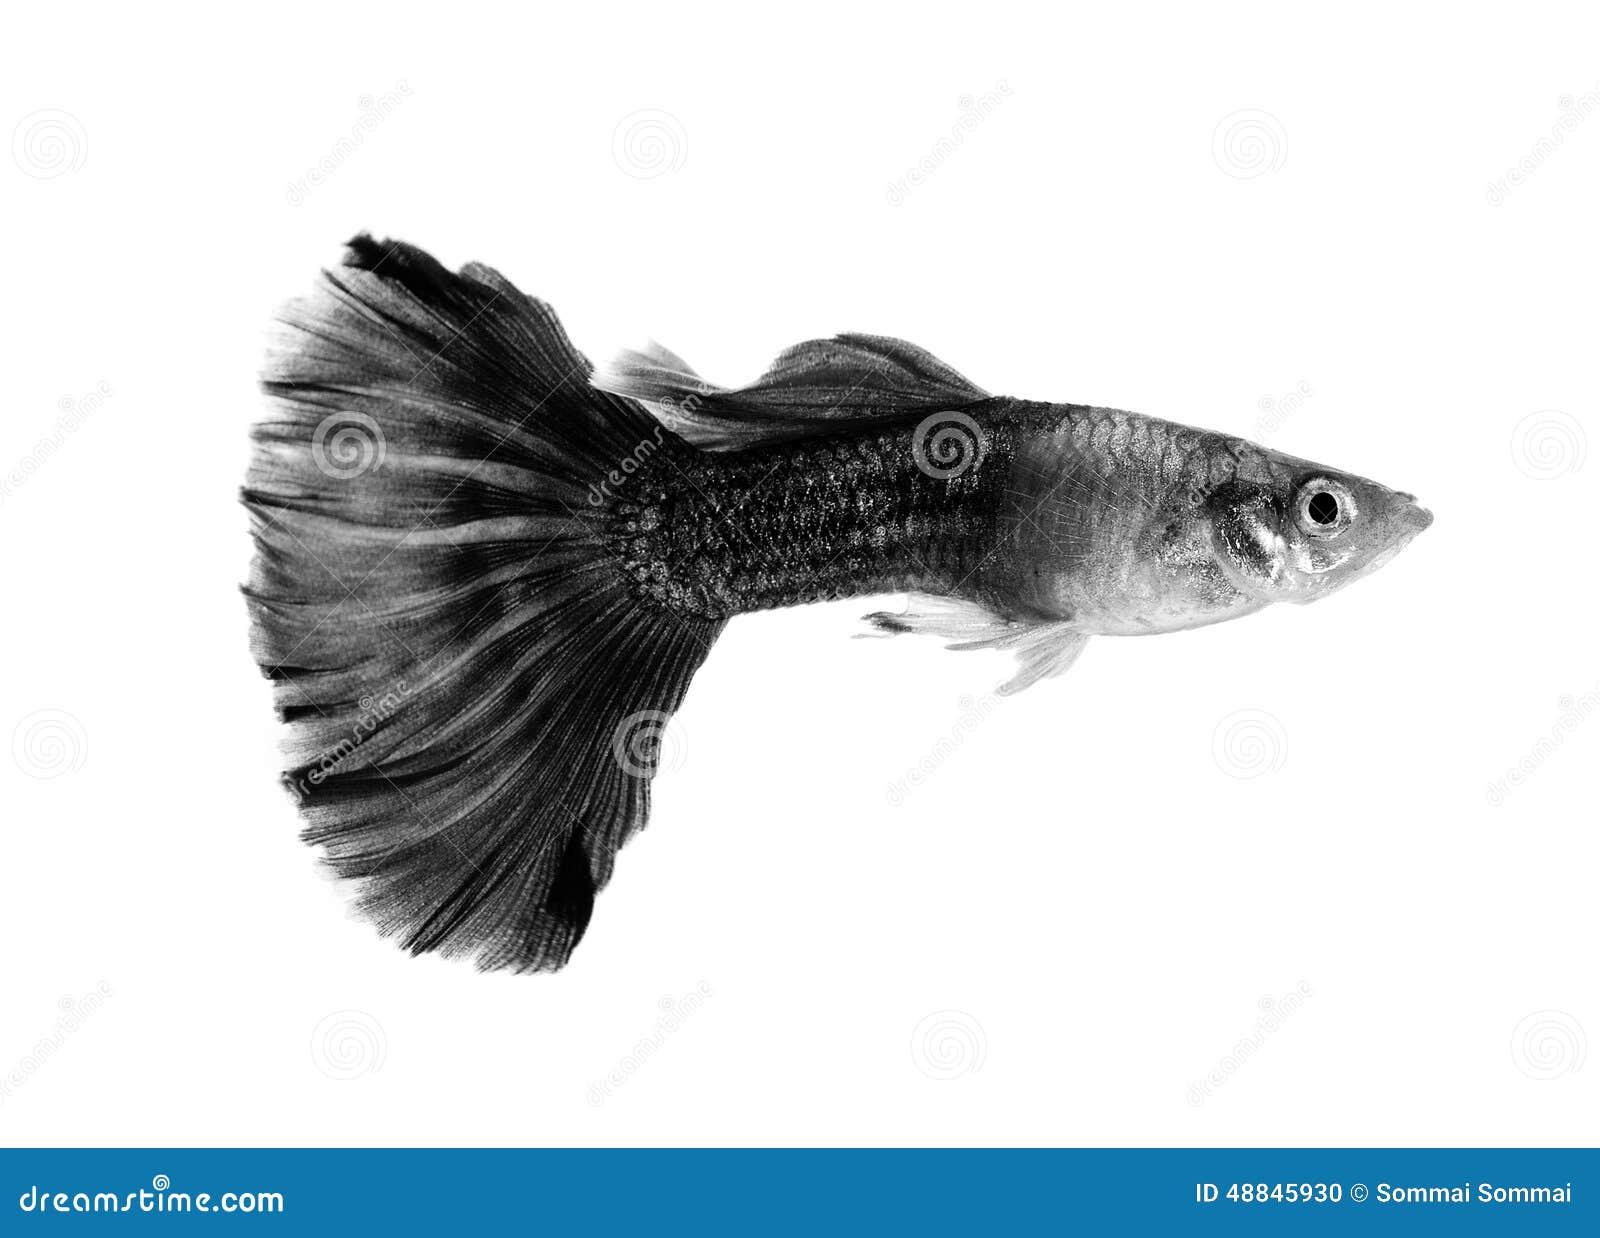 Black guppy fish on white background